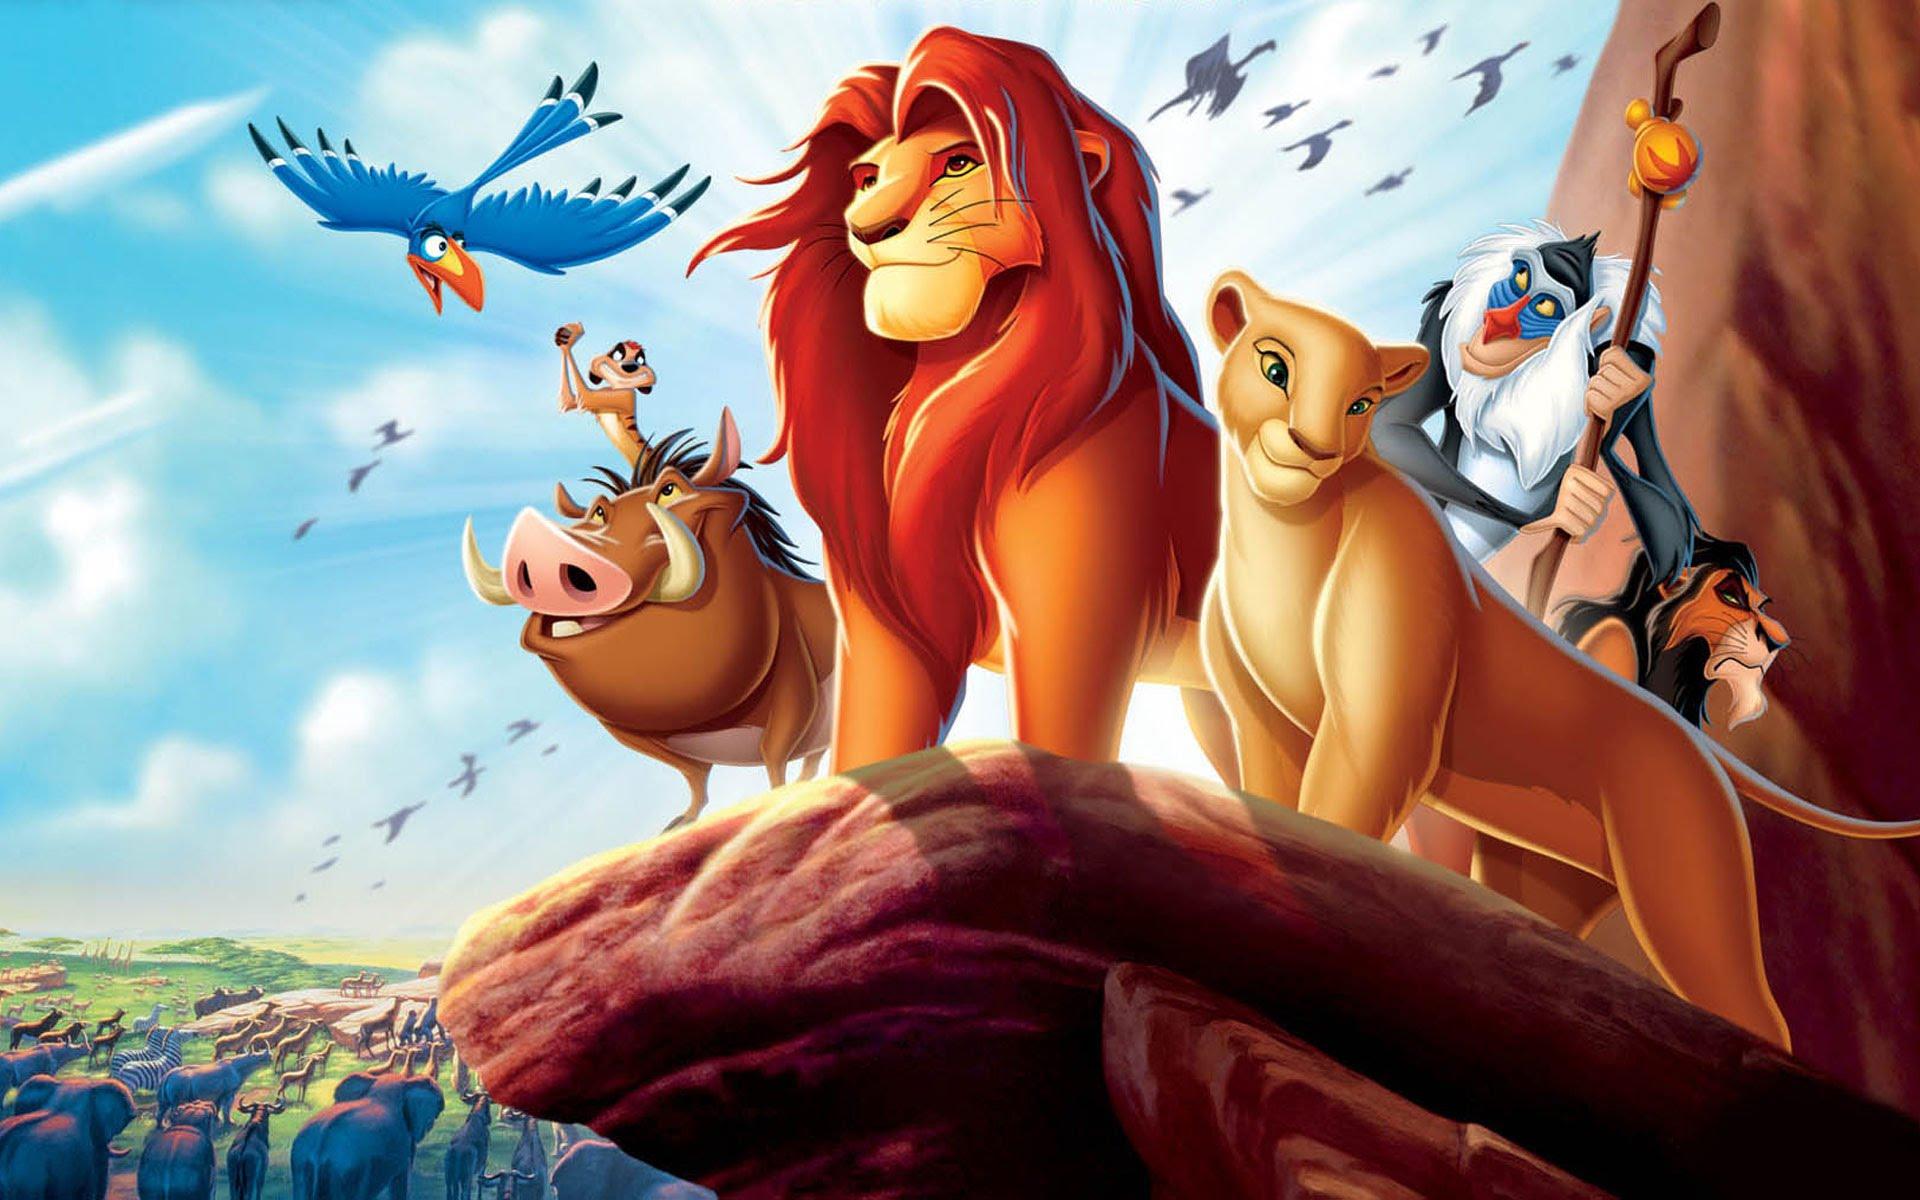 http://www.youredm.com/wp-content/uploads/2017/11/the-lion-king-disney-reboot.jpg